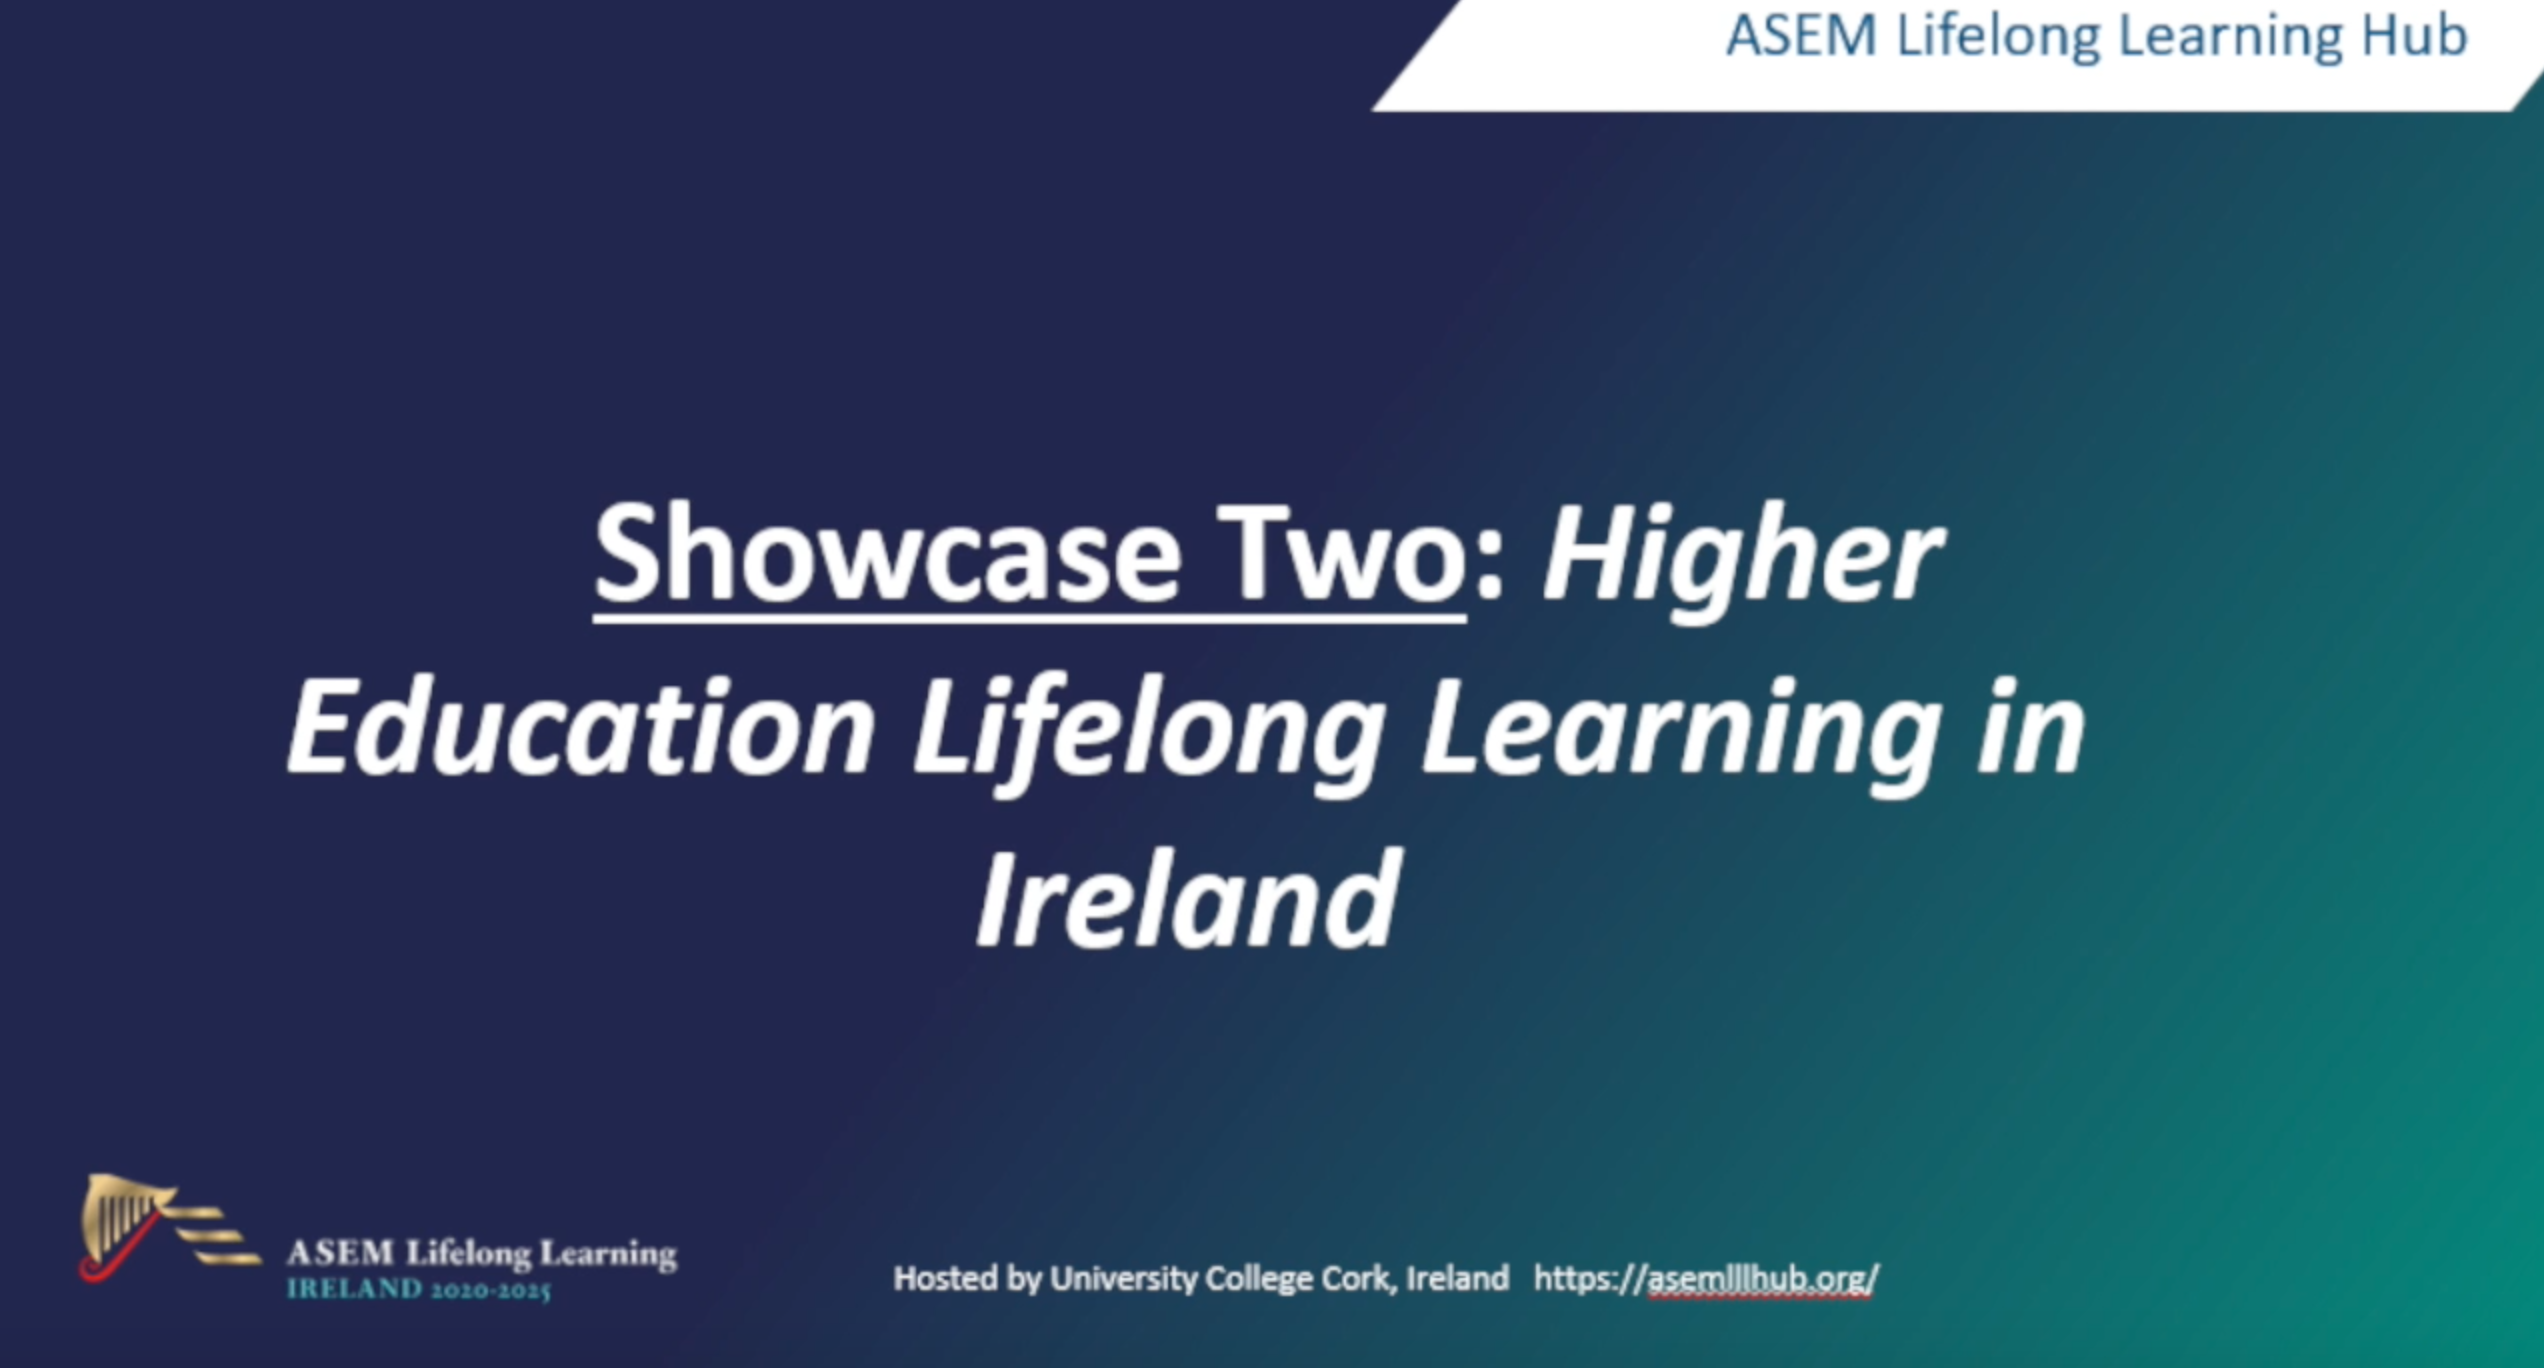 Screenshot-2020-11-02-at-13.49.39 | ASEM Lifelong Learning